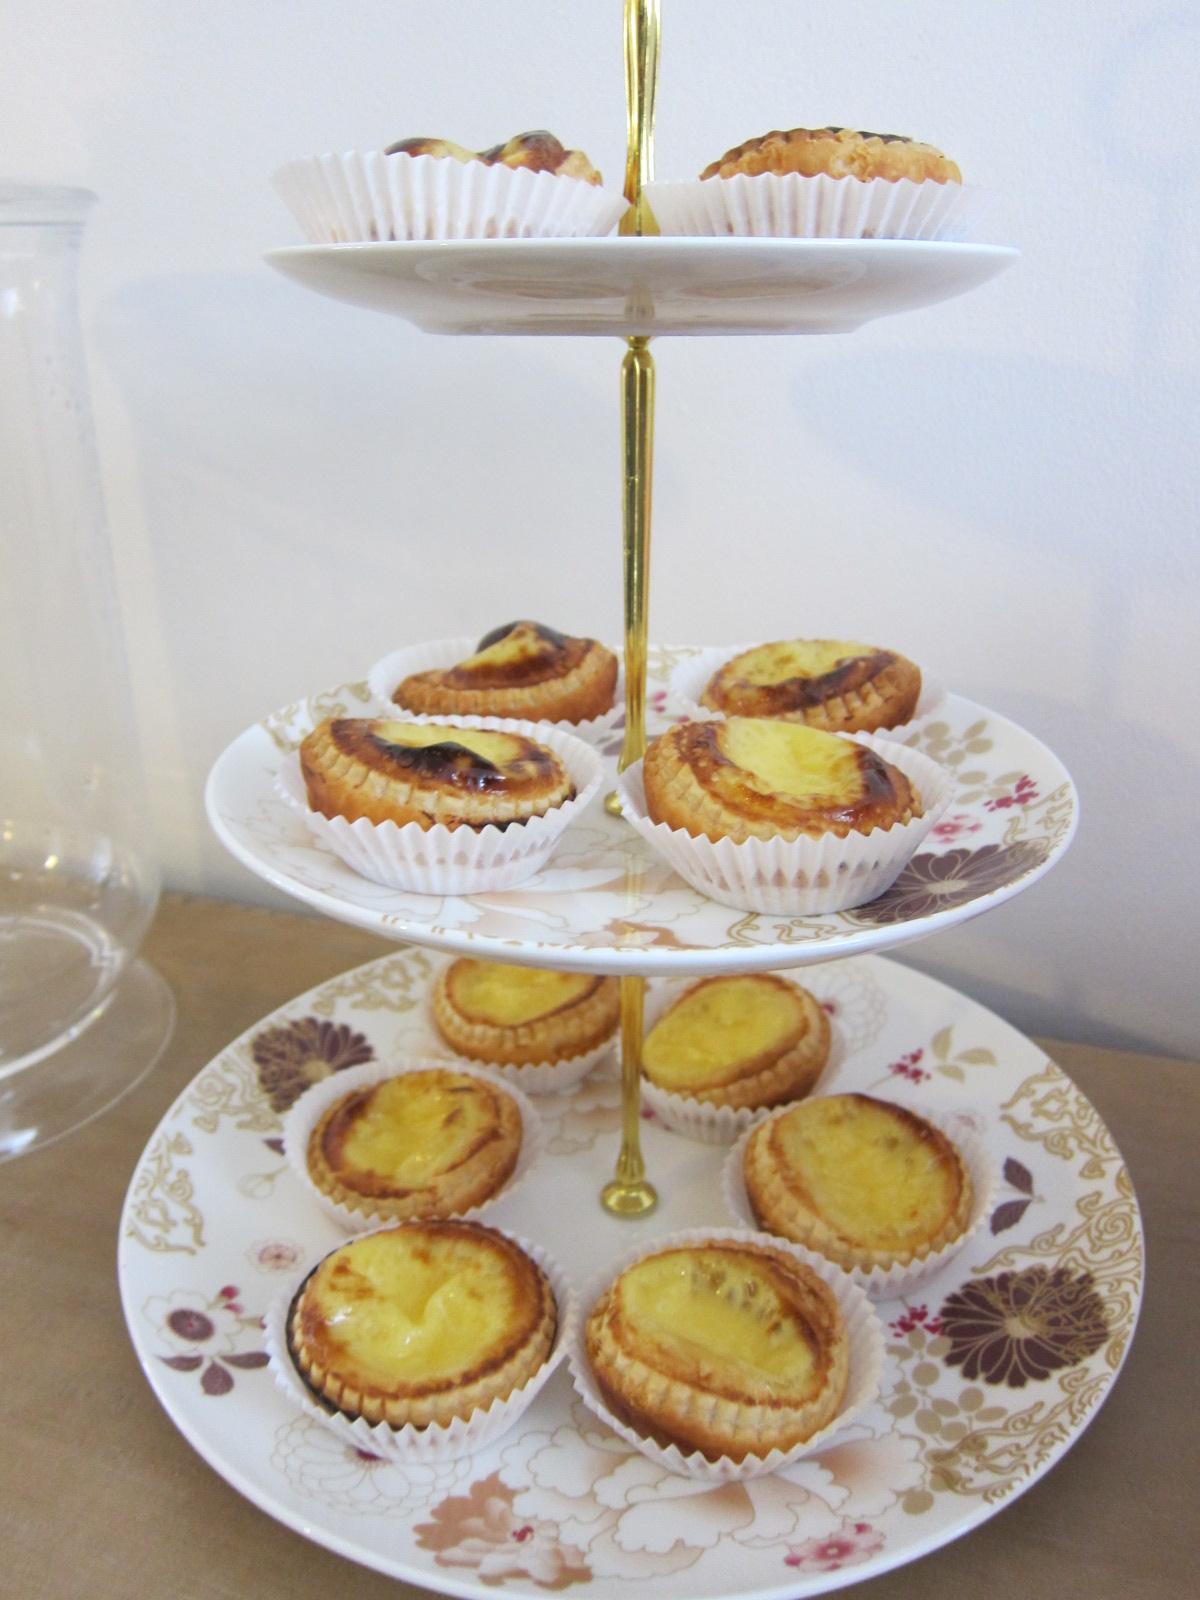 Cheats way egg tarts aka dan tat hong kong style lucy for Easy housewarming party food